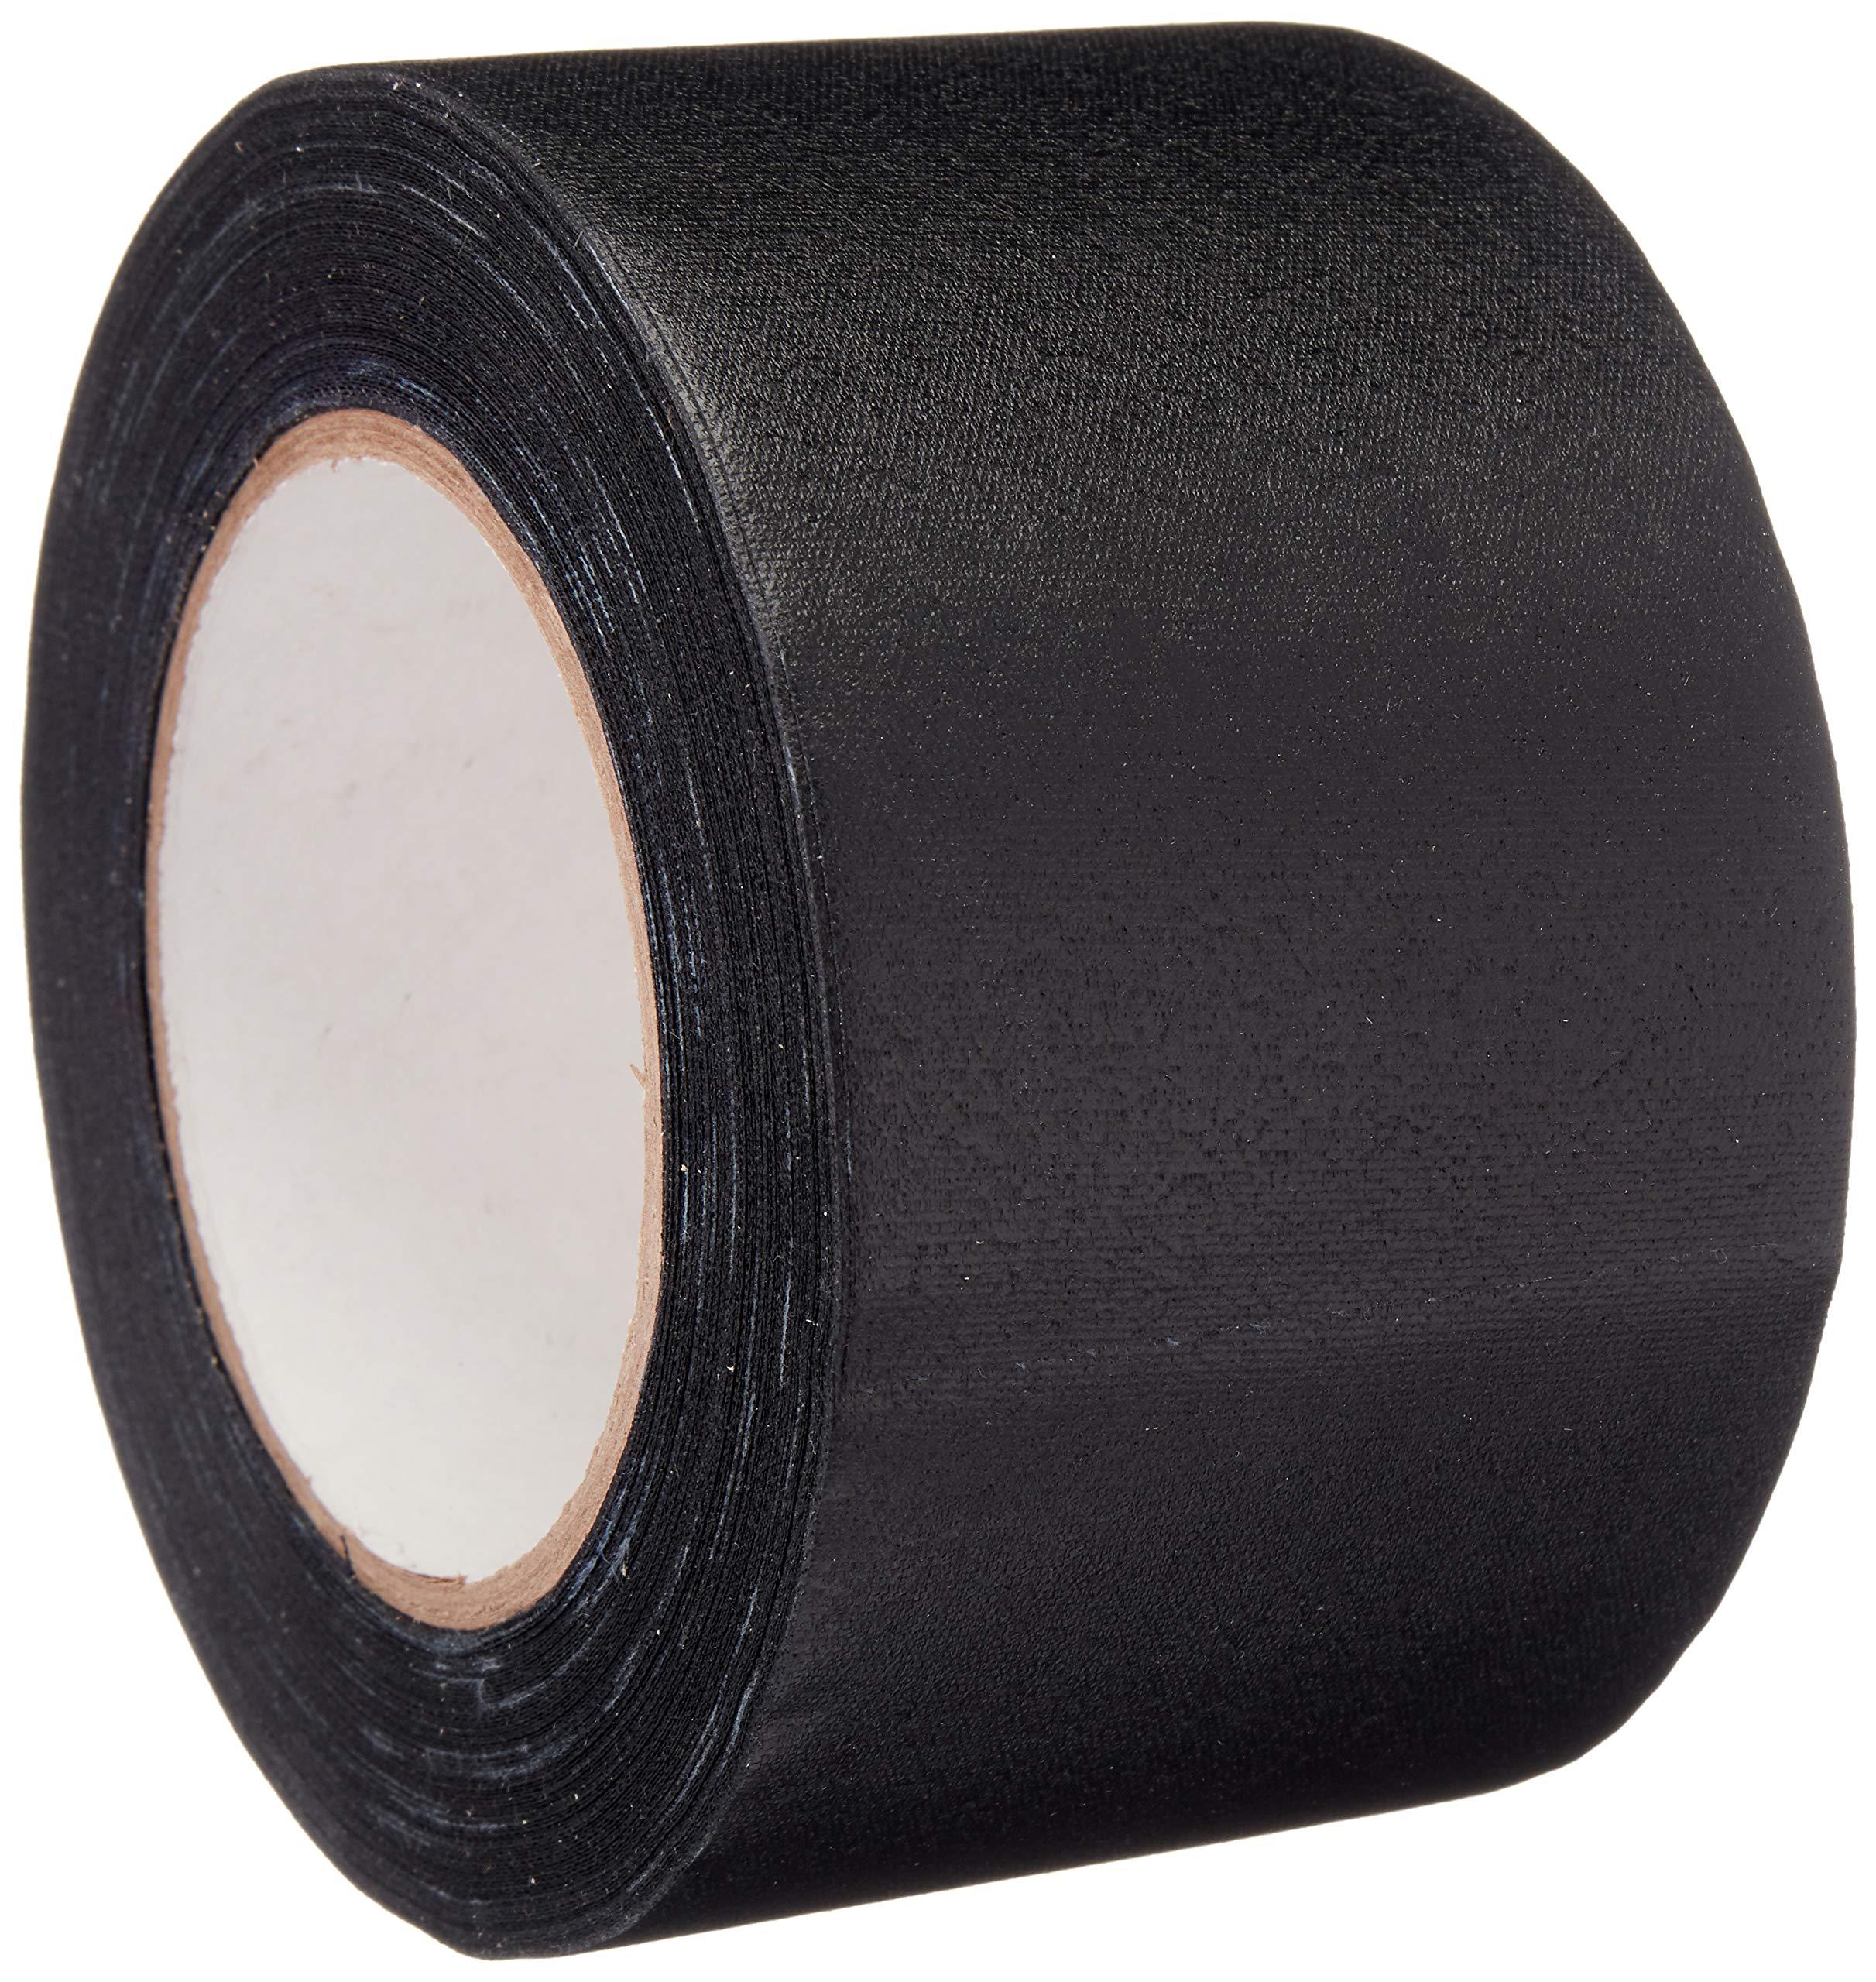 Amazon Basics No Residue, Non-Reflective Gaffers Tape - 3 Inch x 90 Feet, Black